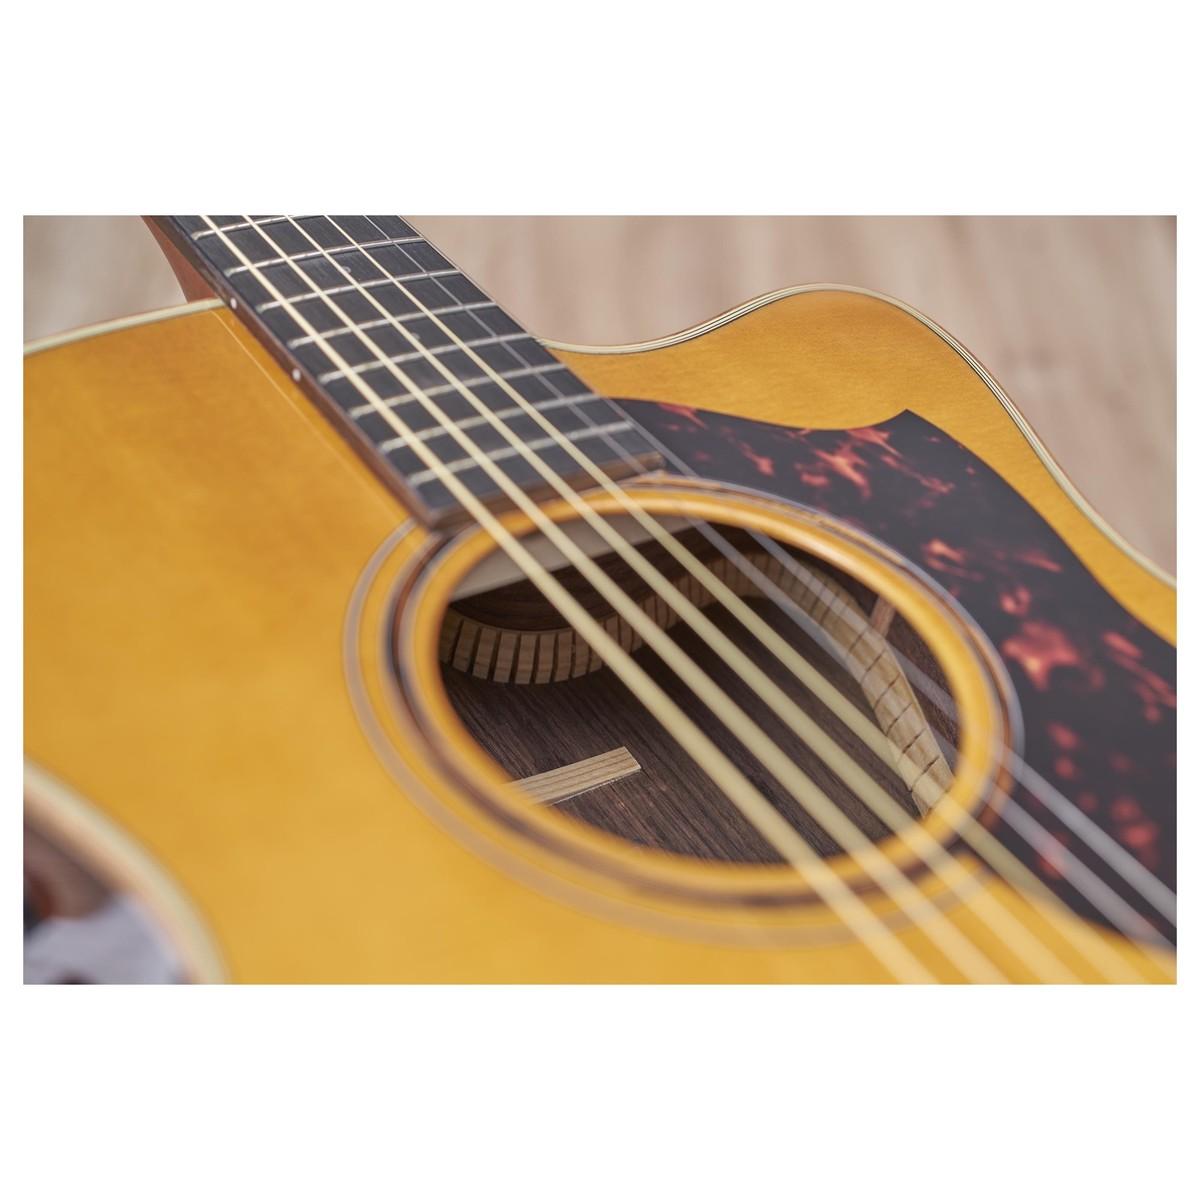 Yamaha A3r Rosewood Electro Acoustic Guitar Tobacco Brown Sunburst